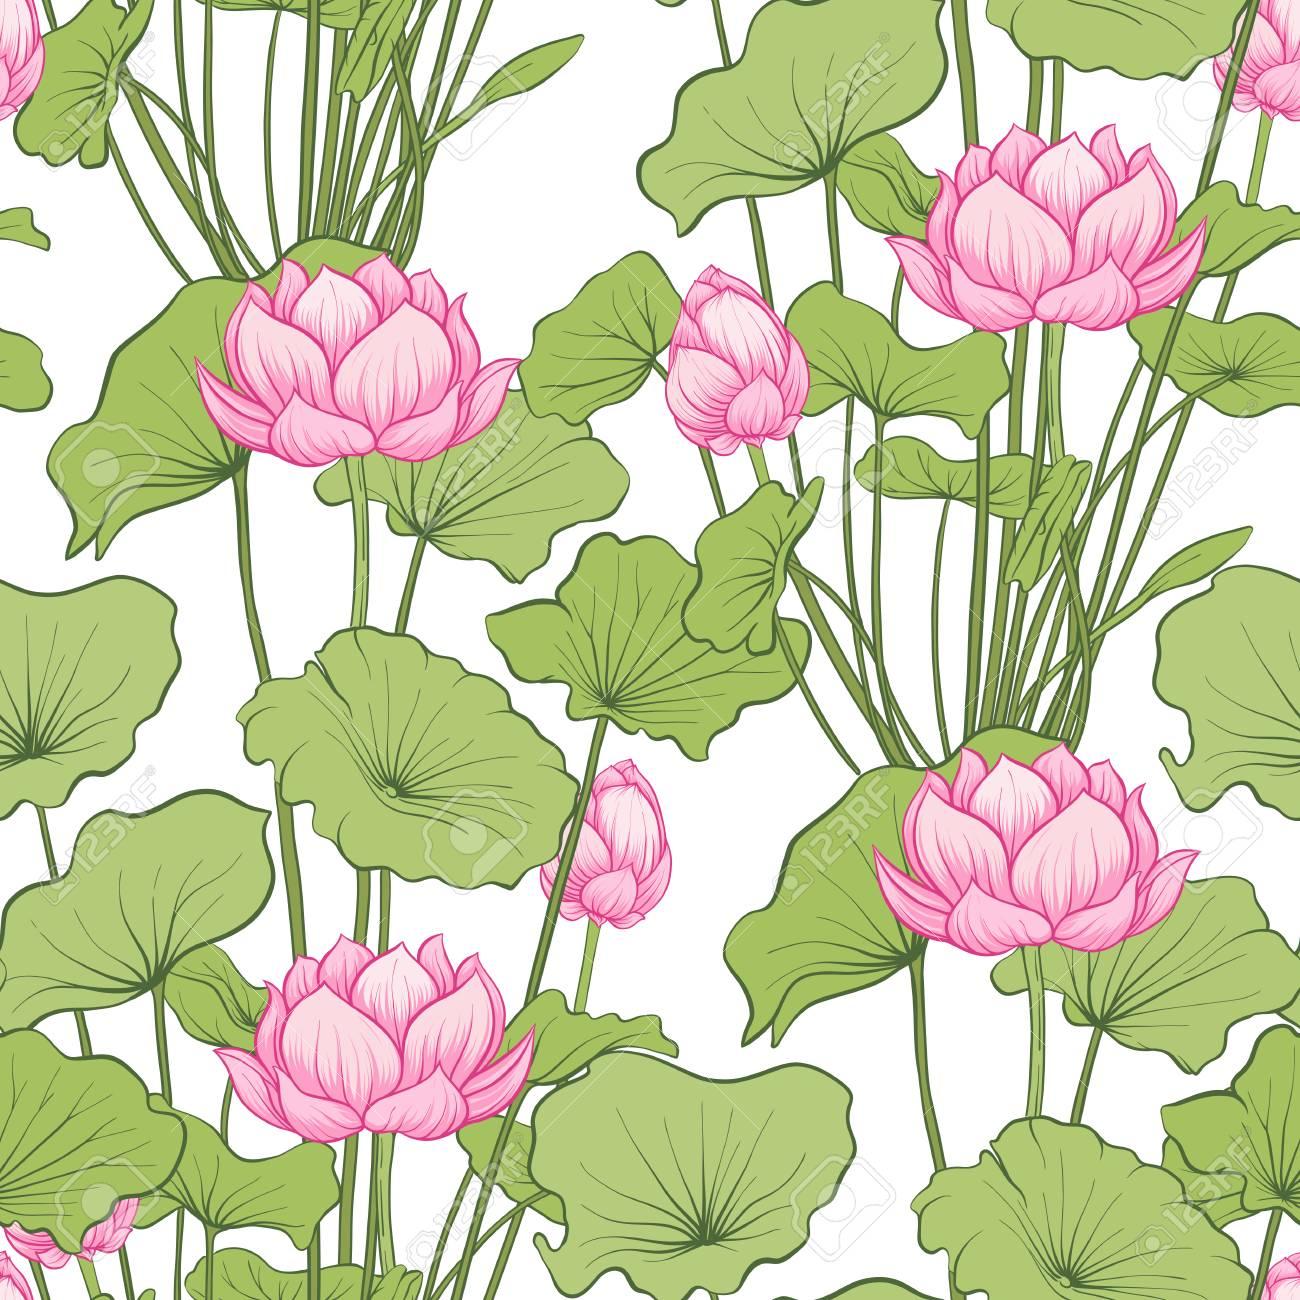 Seamless pattern, background with lotus flower. Botanical illustration style. Stock vector illustration. - 111839908